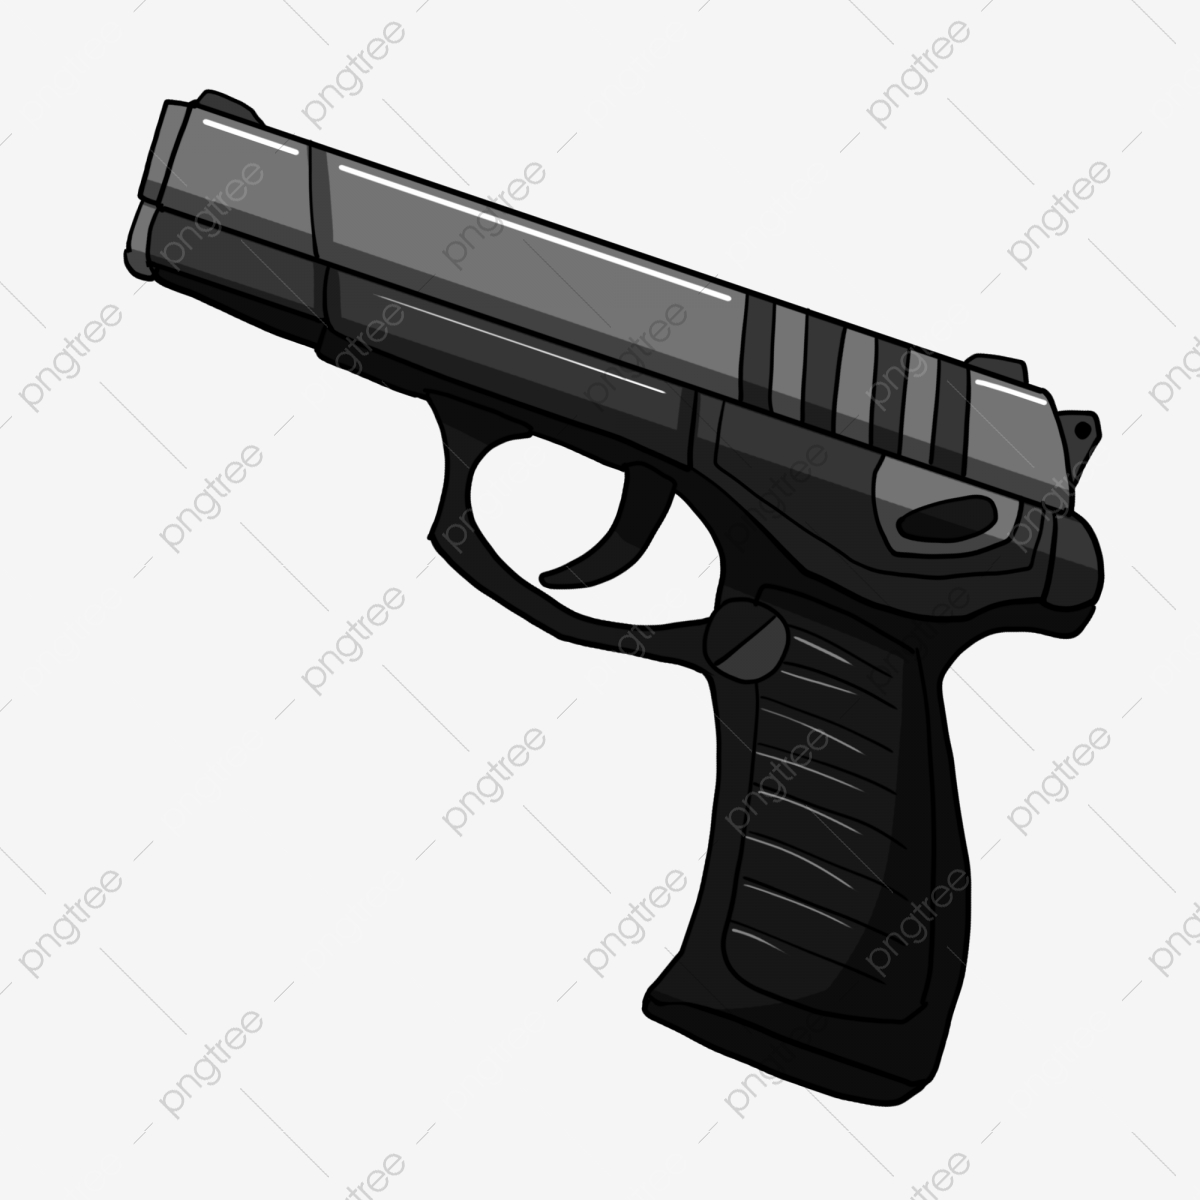 Clipart gun file. Black pistol front firearms